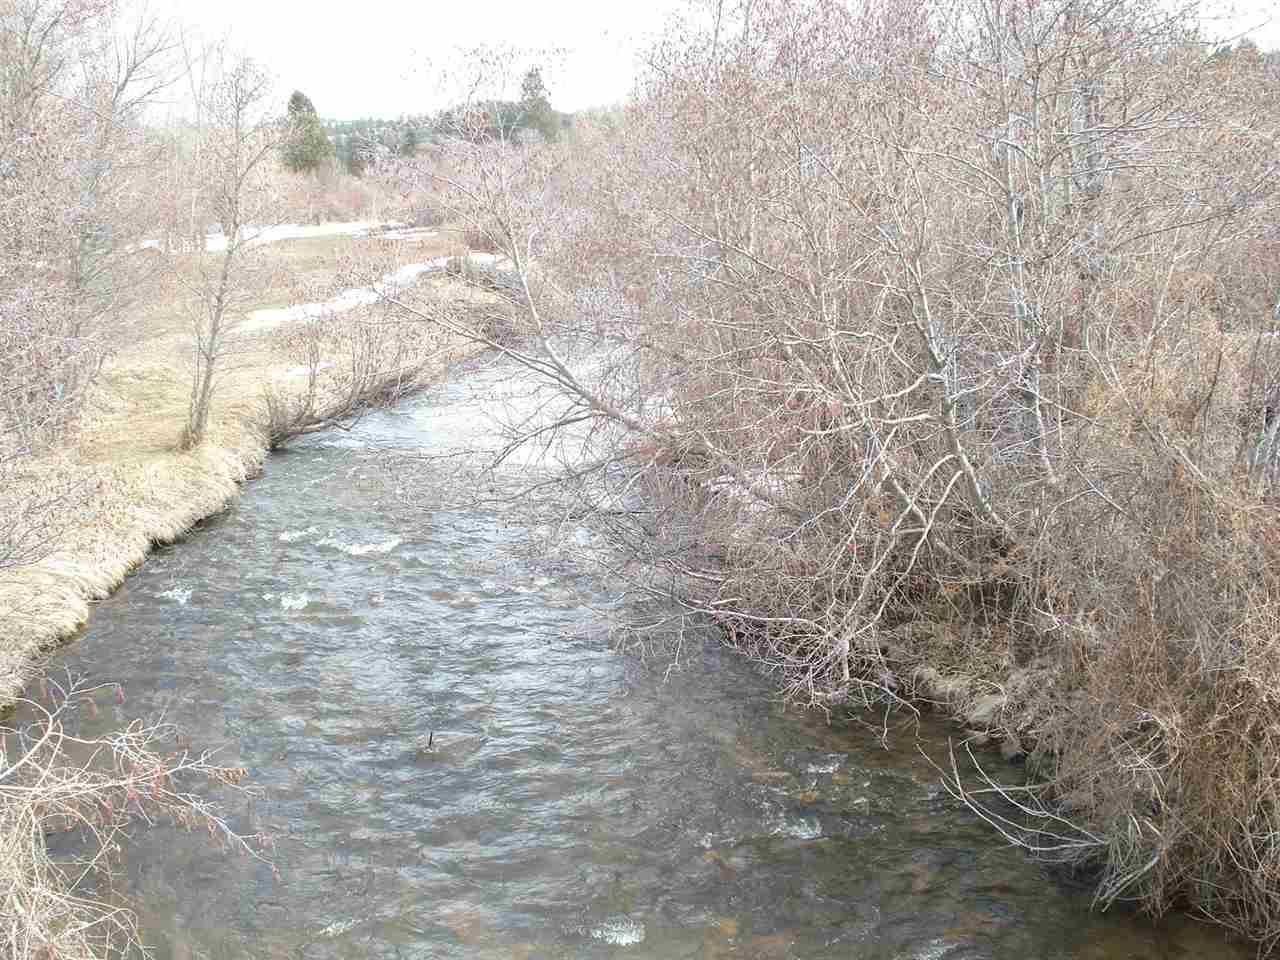 Tbd Mcclellan Creek Road, Clancy, MT 59634